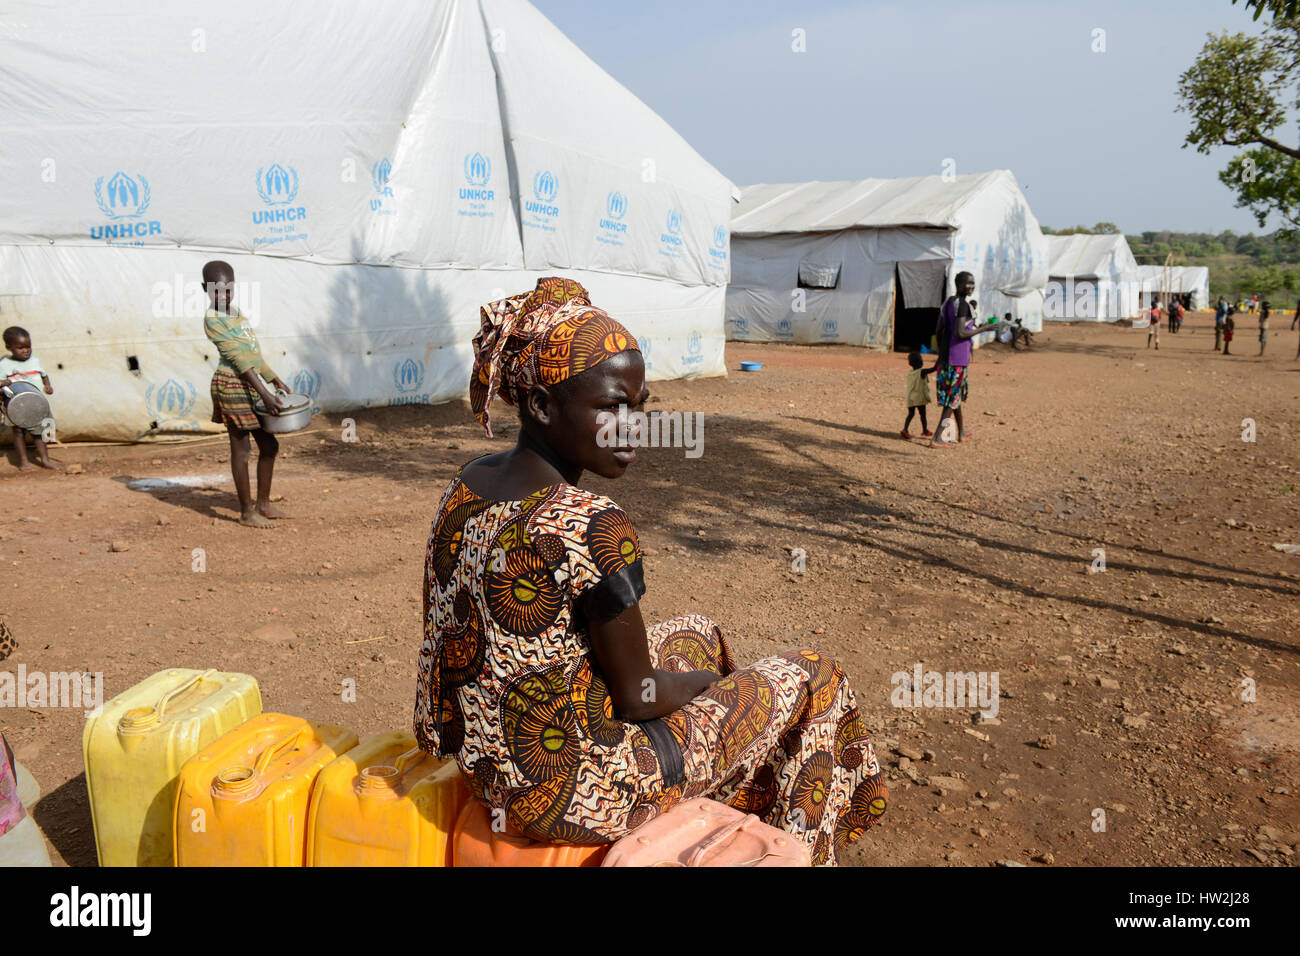 UGANDA, Arua, south sudanese refugees in Bidi Bidi refugee settlement / suedsudanesische Fluechtlinge im Fluechtlingslager - Stock Image